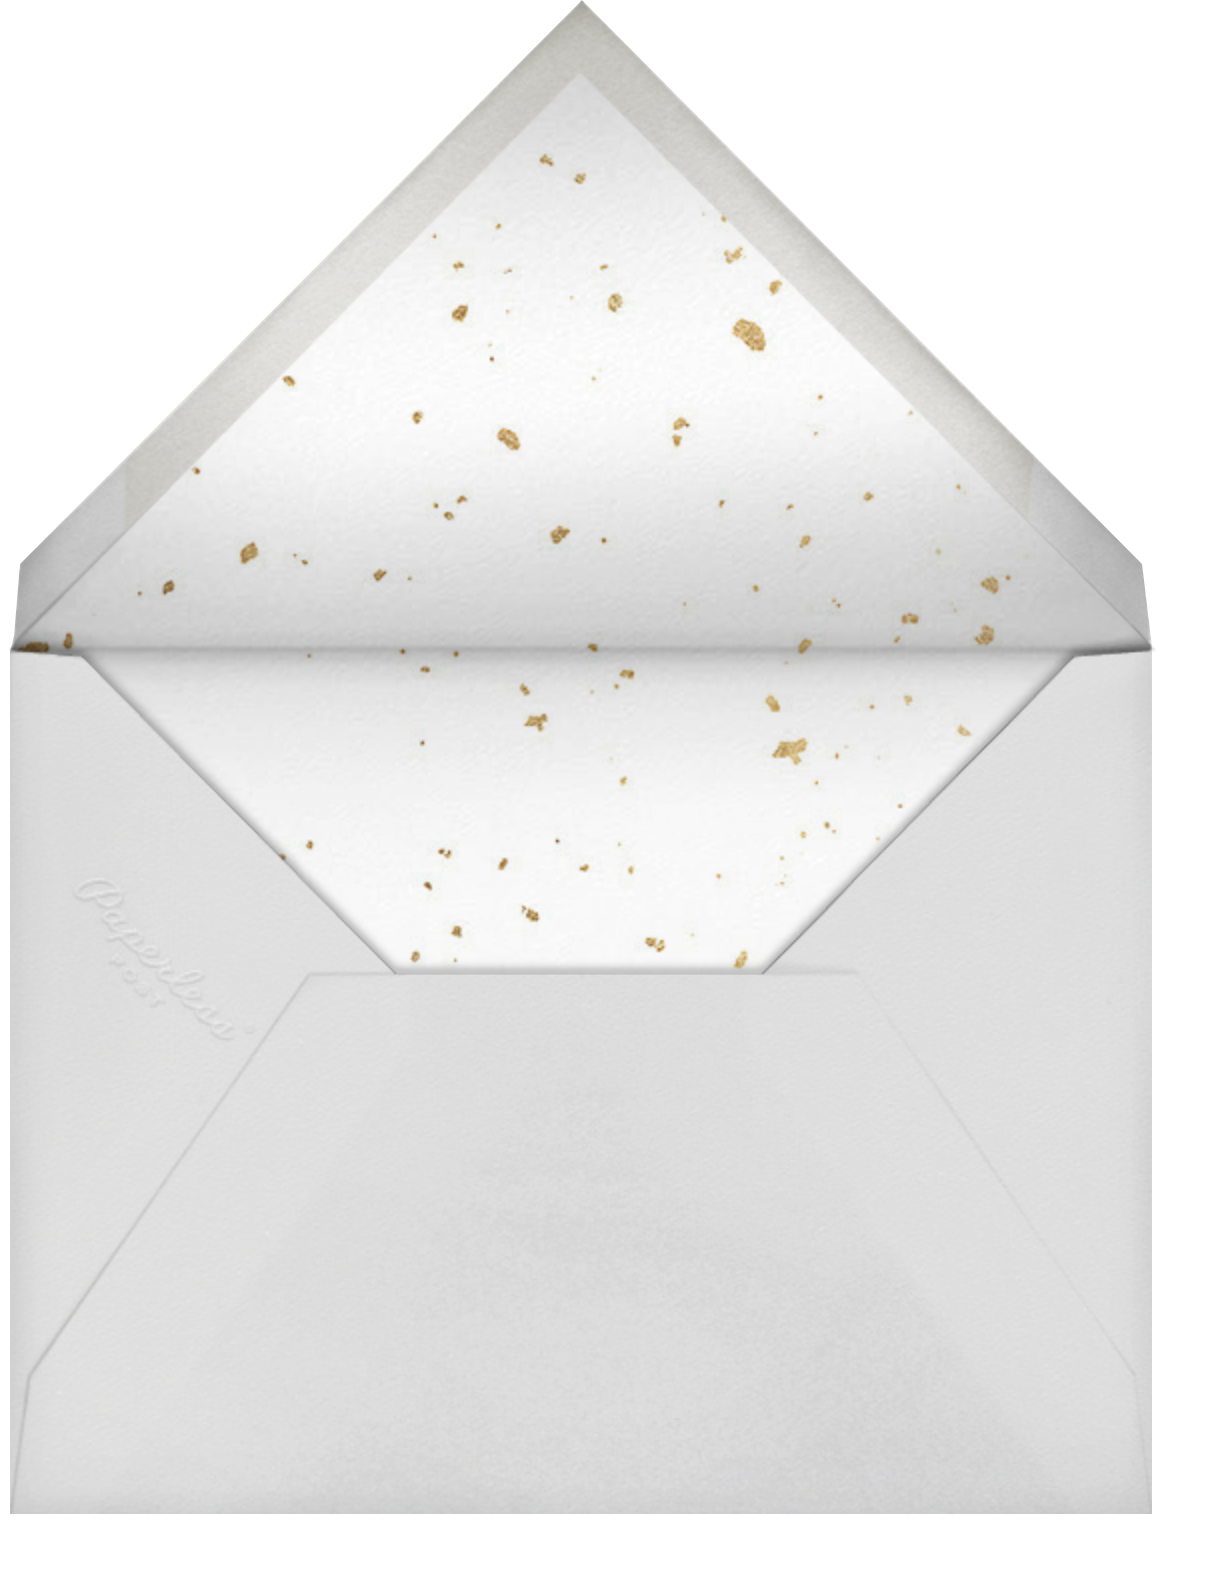 Dissolve (Invitation) - & - Paperless Post - Virtual wedding invitations - envelope back